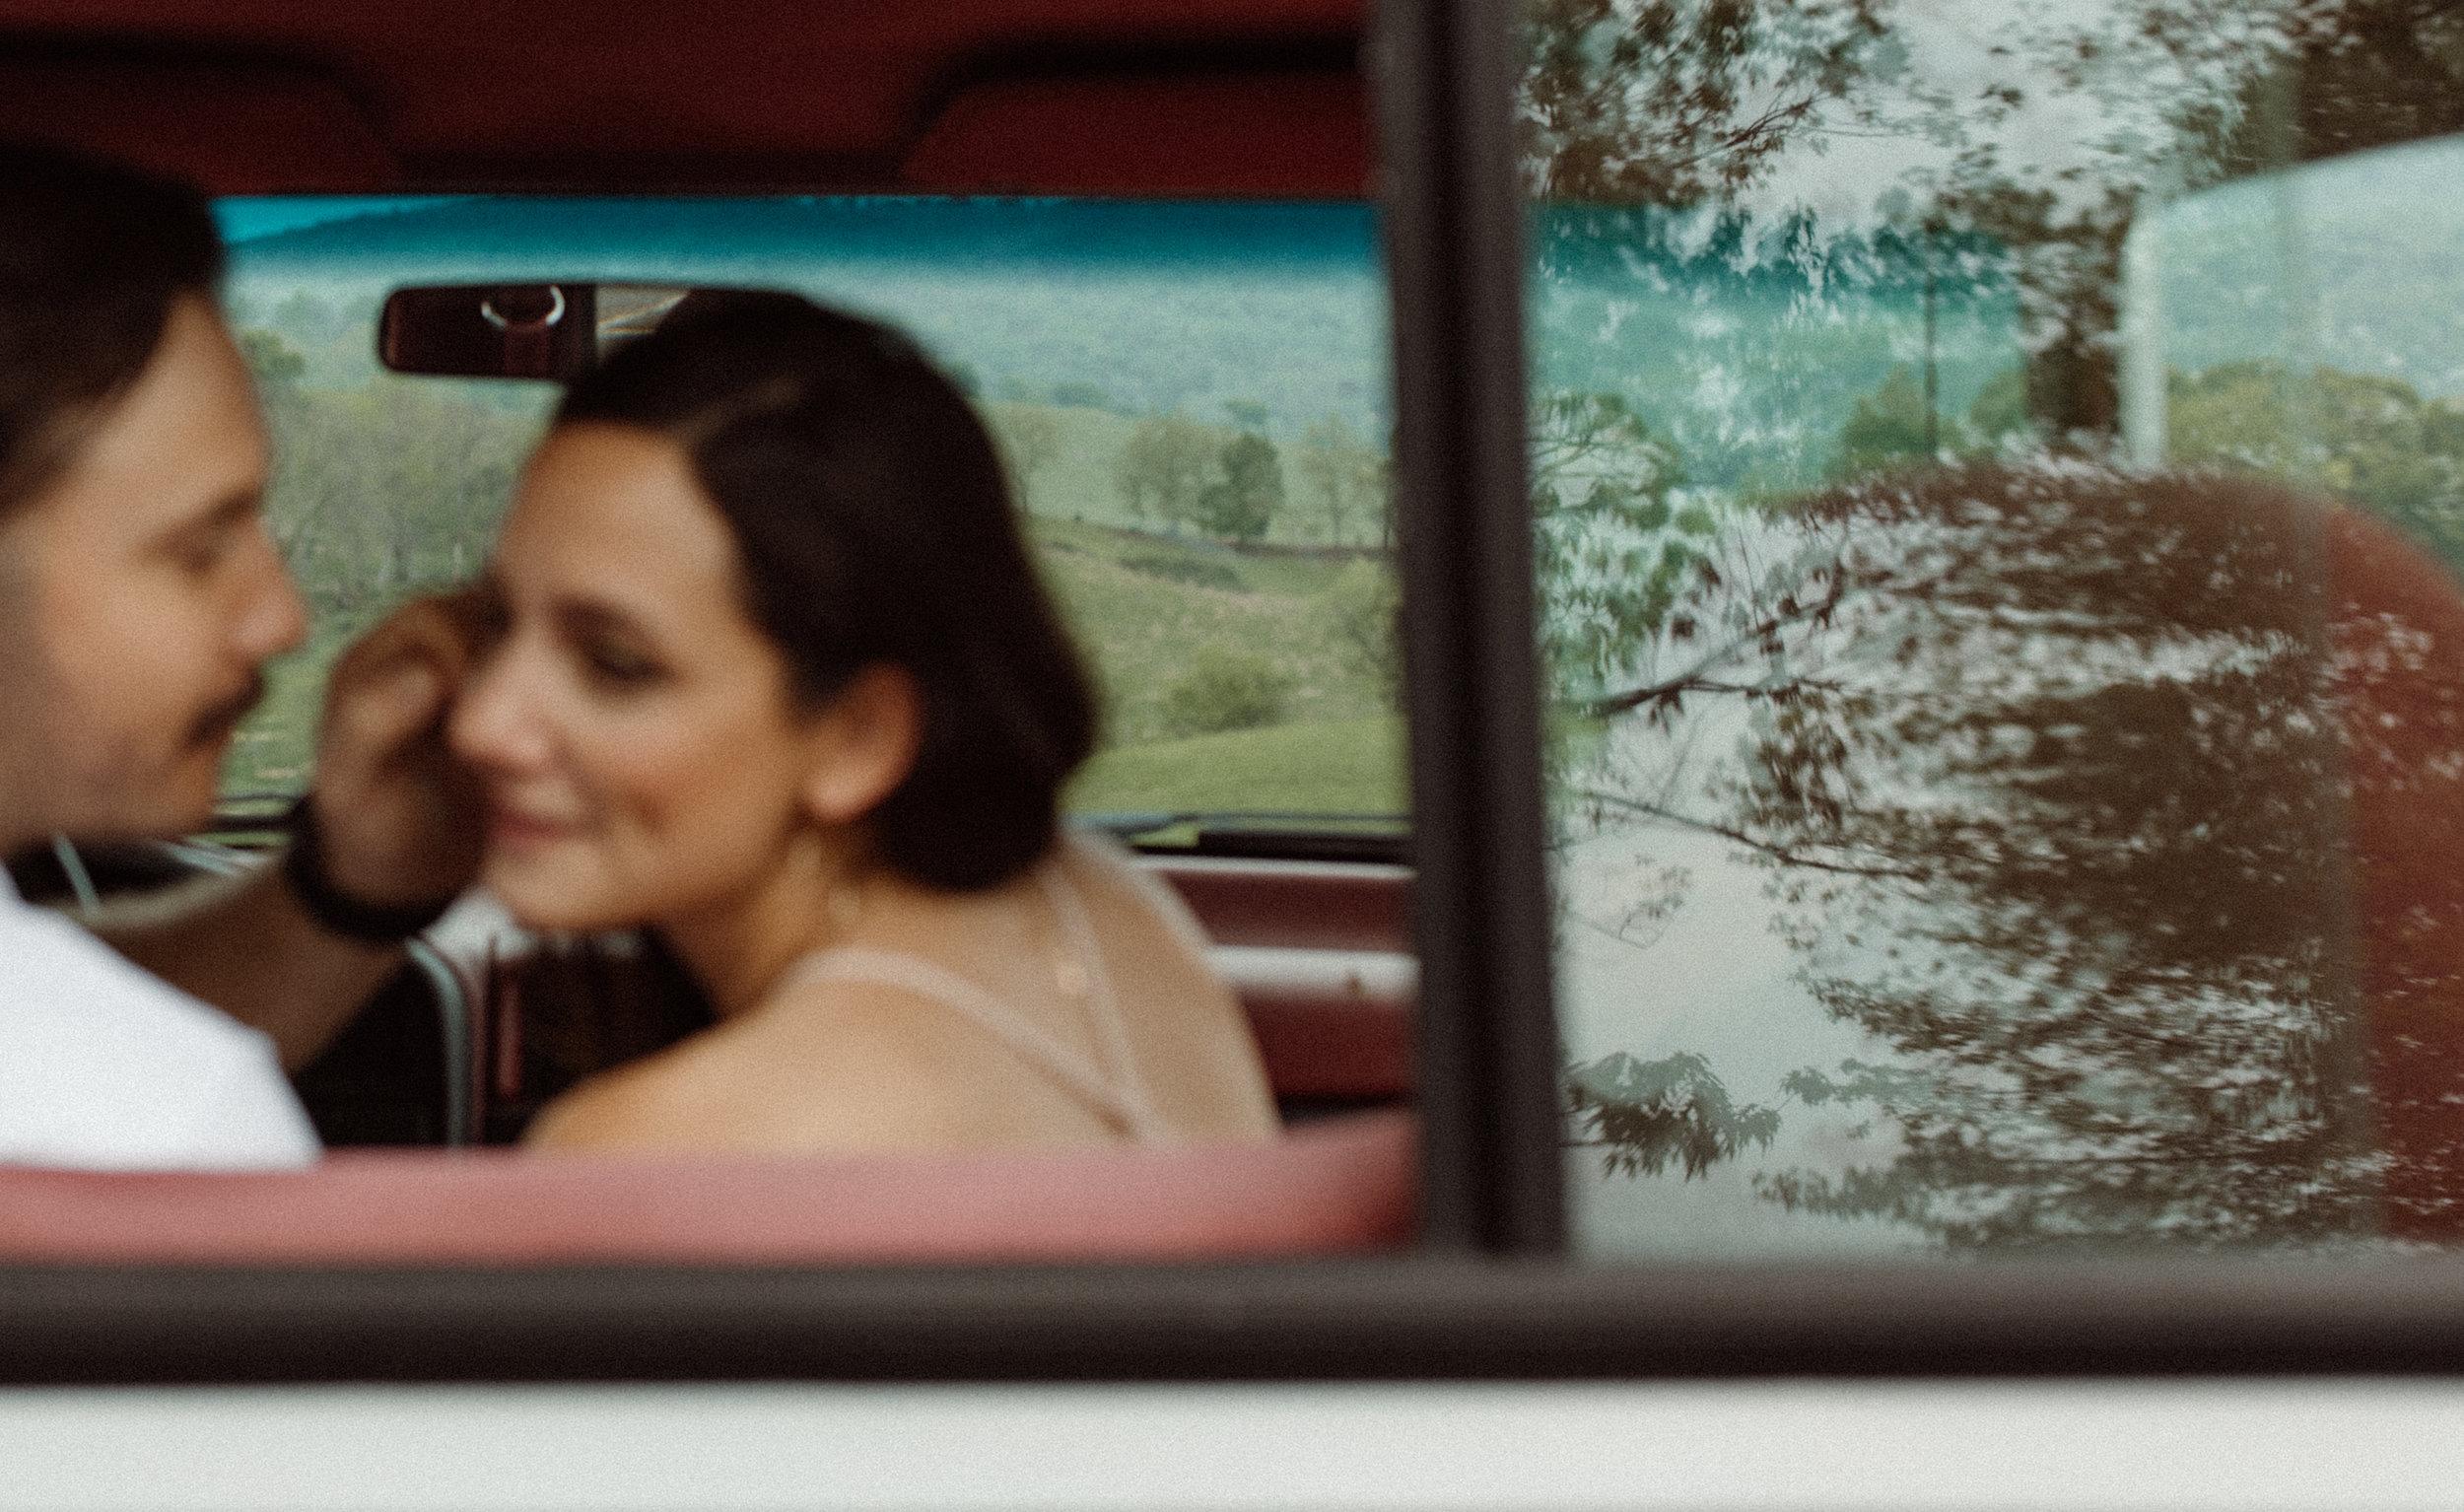 kelsey&mark-engagement-skymeadows-2019-peytoncurry-8546.jpg